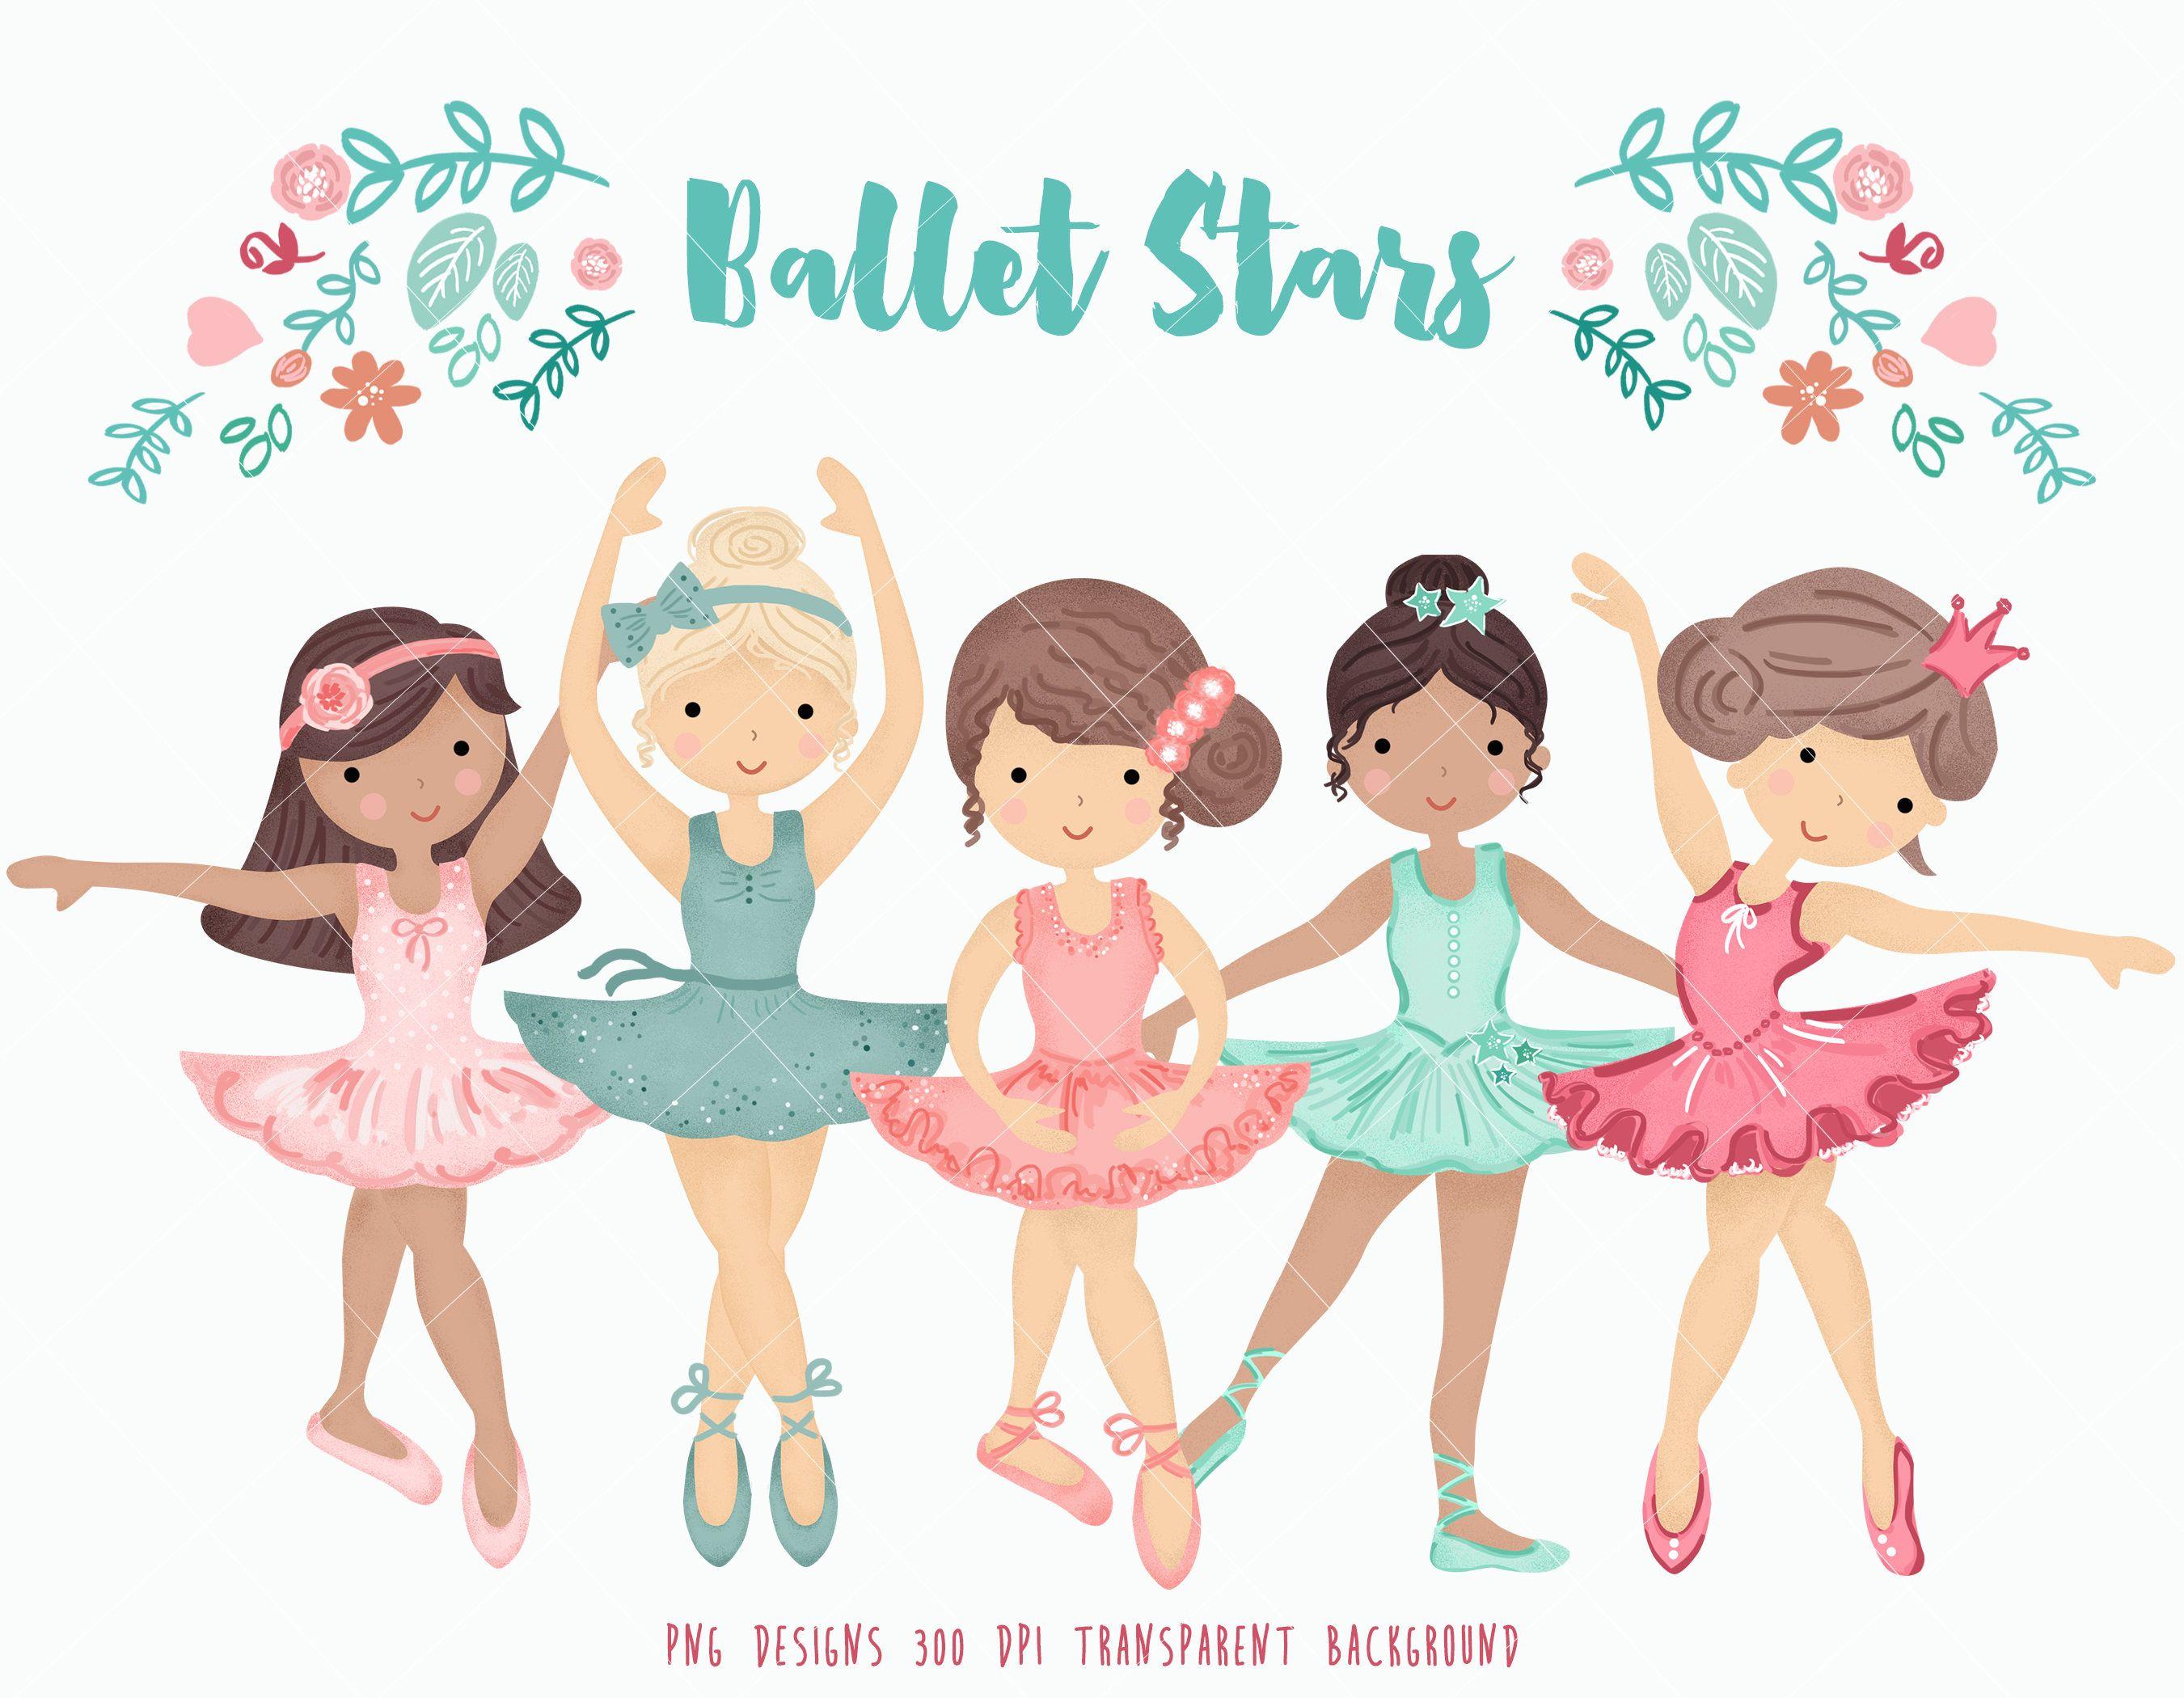 small resolution of ballerina clipart little ballerinas clip art ballet graphic dancing girl ballet illustration prima ballerina dancer hand drawn art